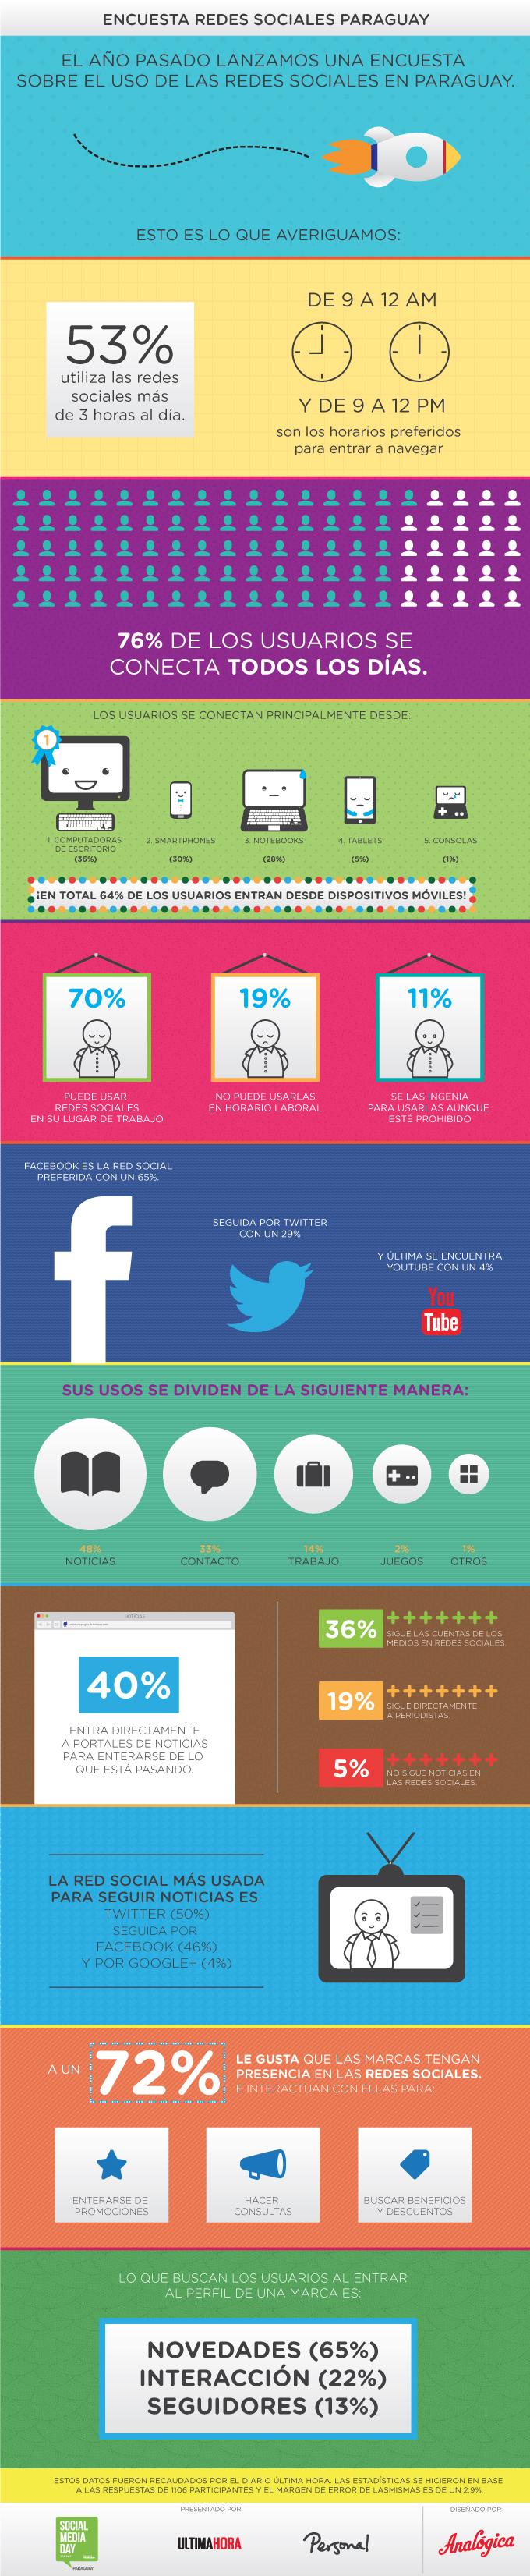 Redes Sociales en Paraguay